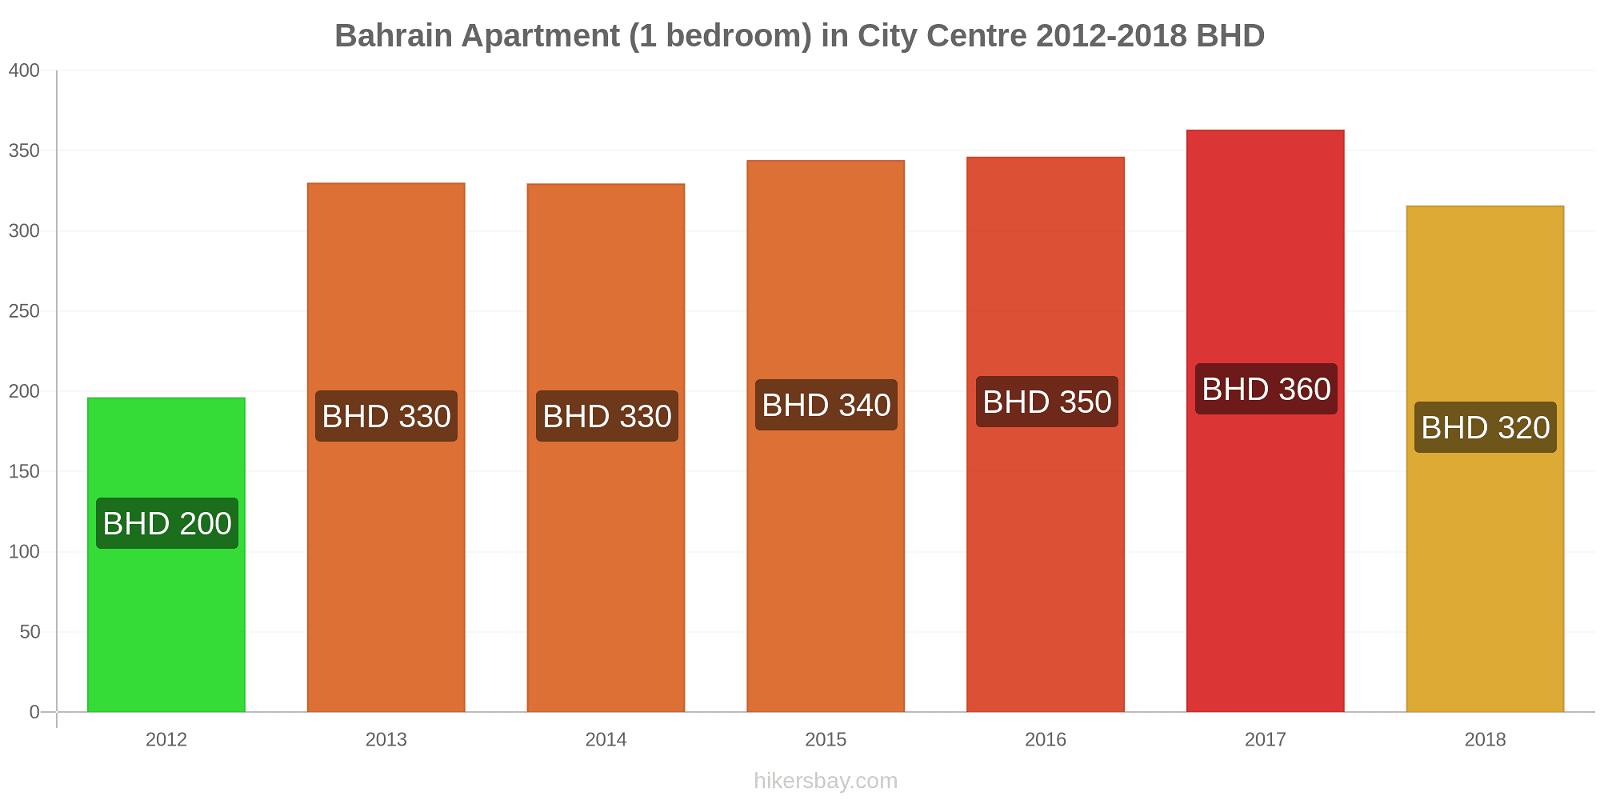 Bahrain price changes Apartment (1 bedroom) in City Centre hikersbay.com